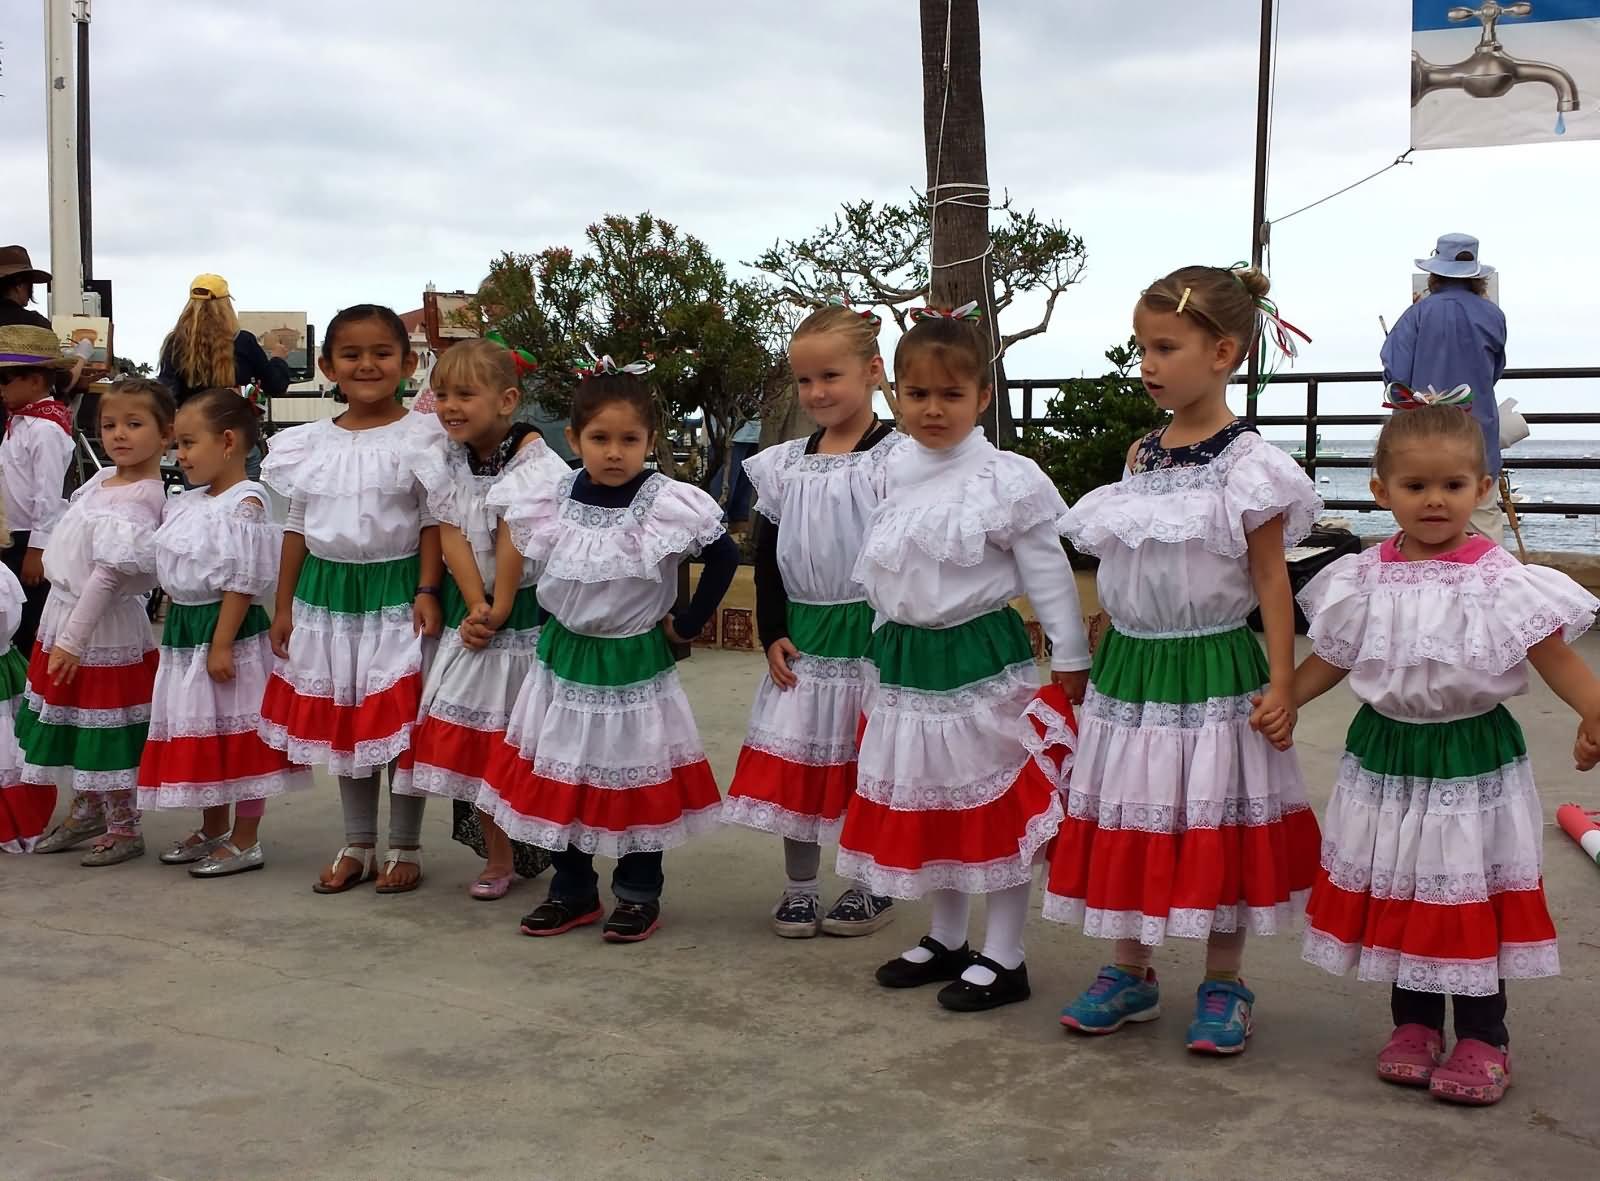 35 Amazing Cinco De Mayo Celebration Pictures And Photos